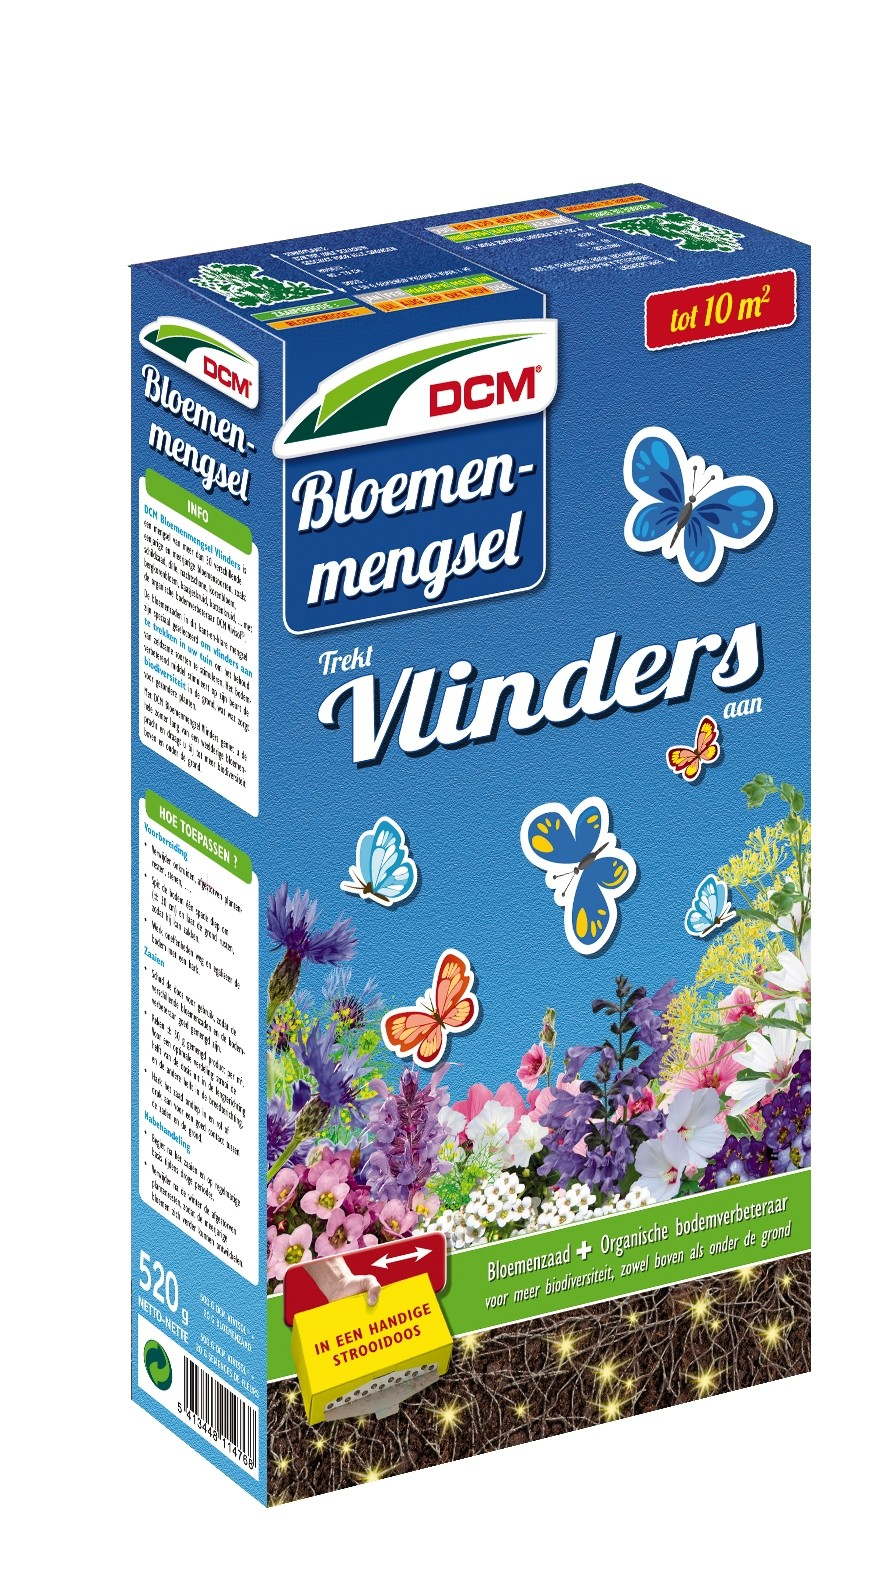 Bloemenmengsel voor vlinders